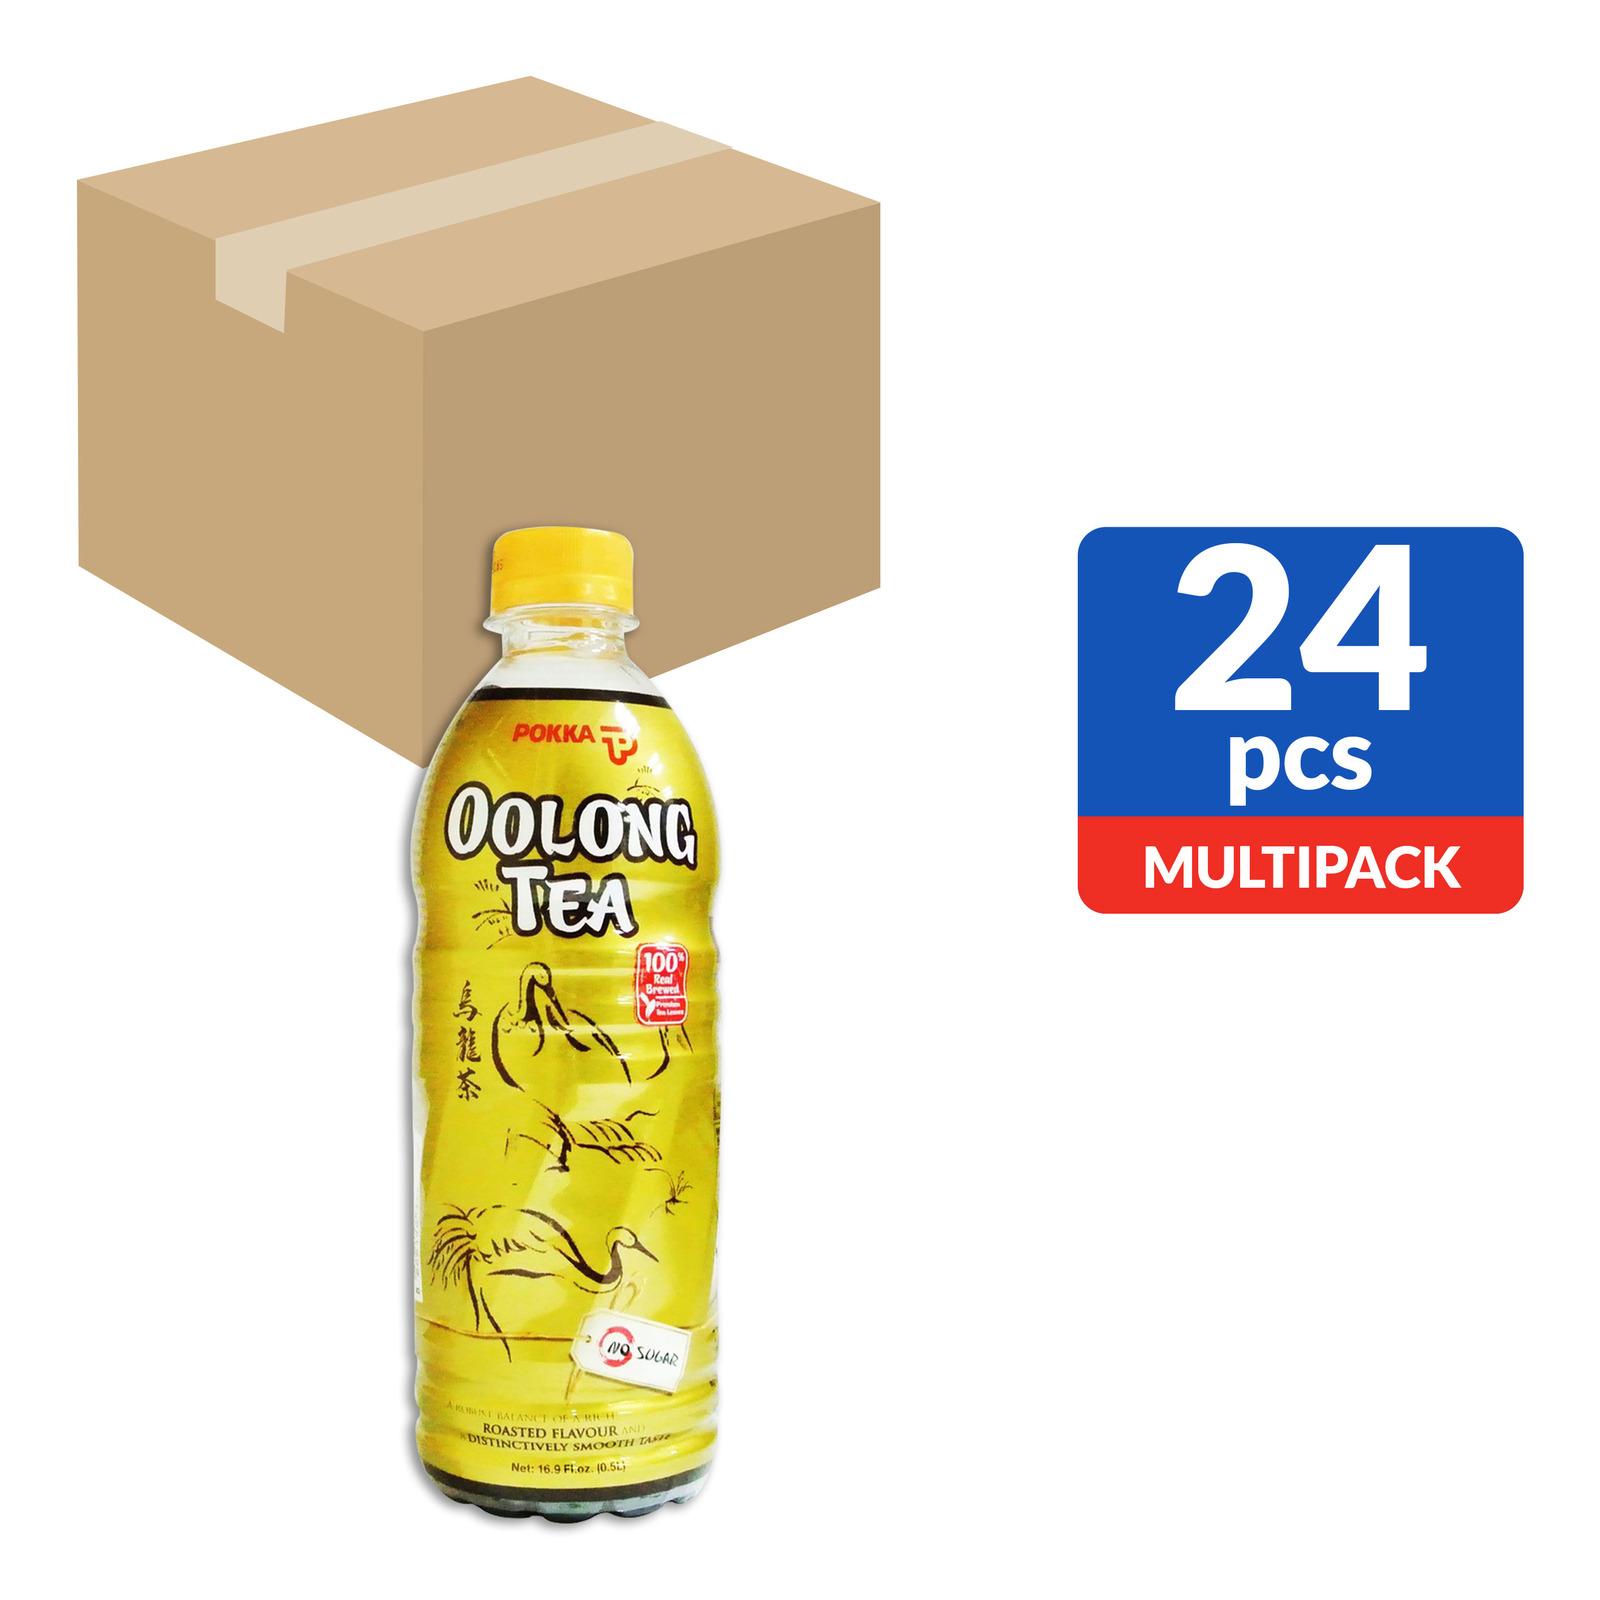 Pokka Bottle Drink - Oolong Tea (No Sugar Added)